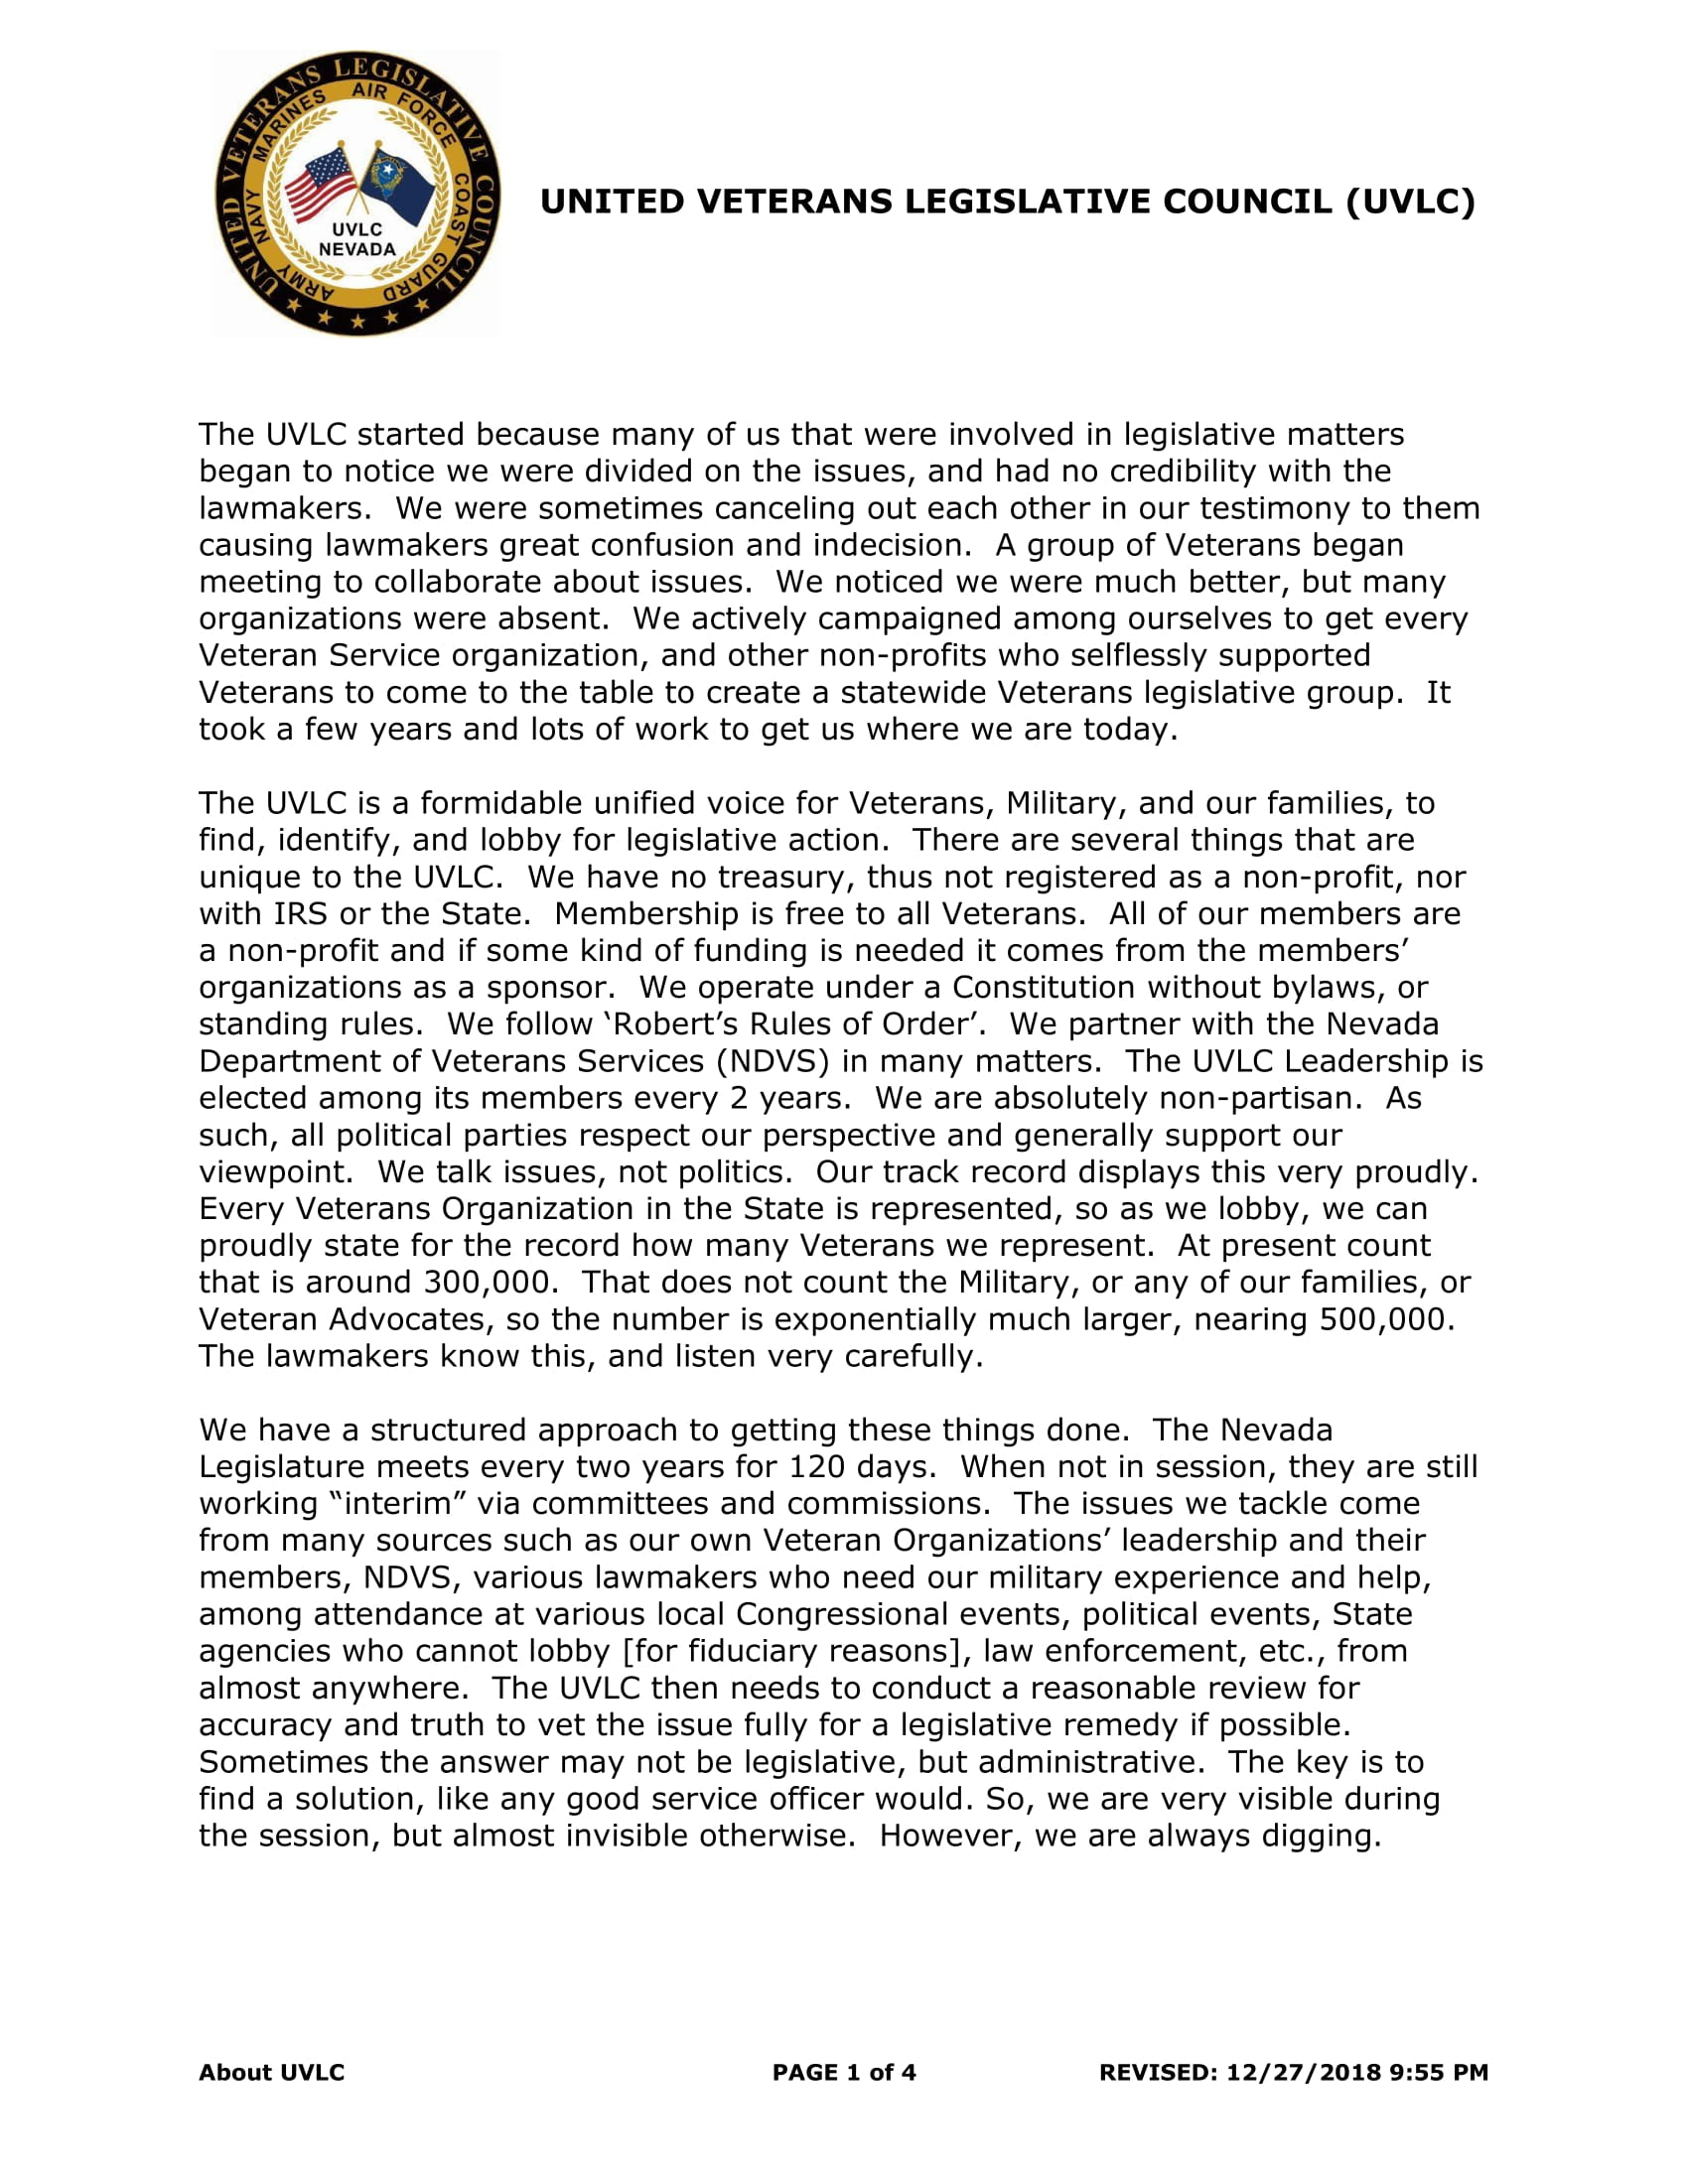 About The United Veterans Legislative Council Nevada Department Of Veterans Services